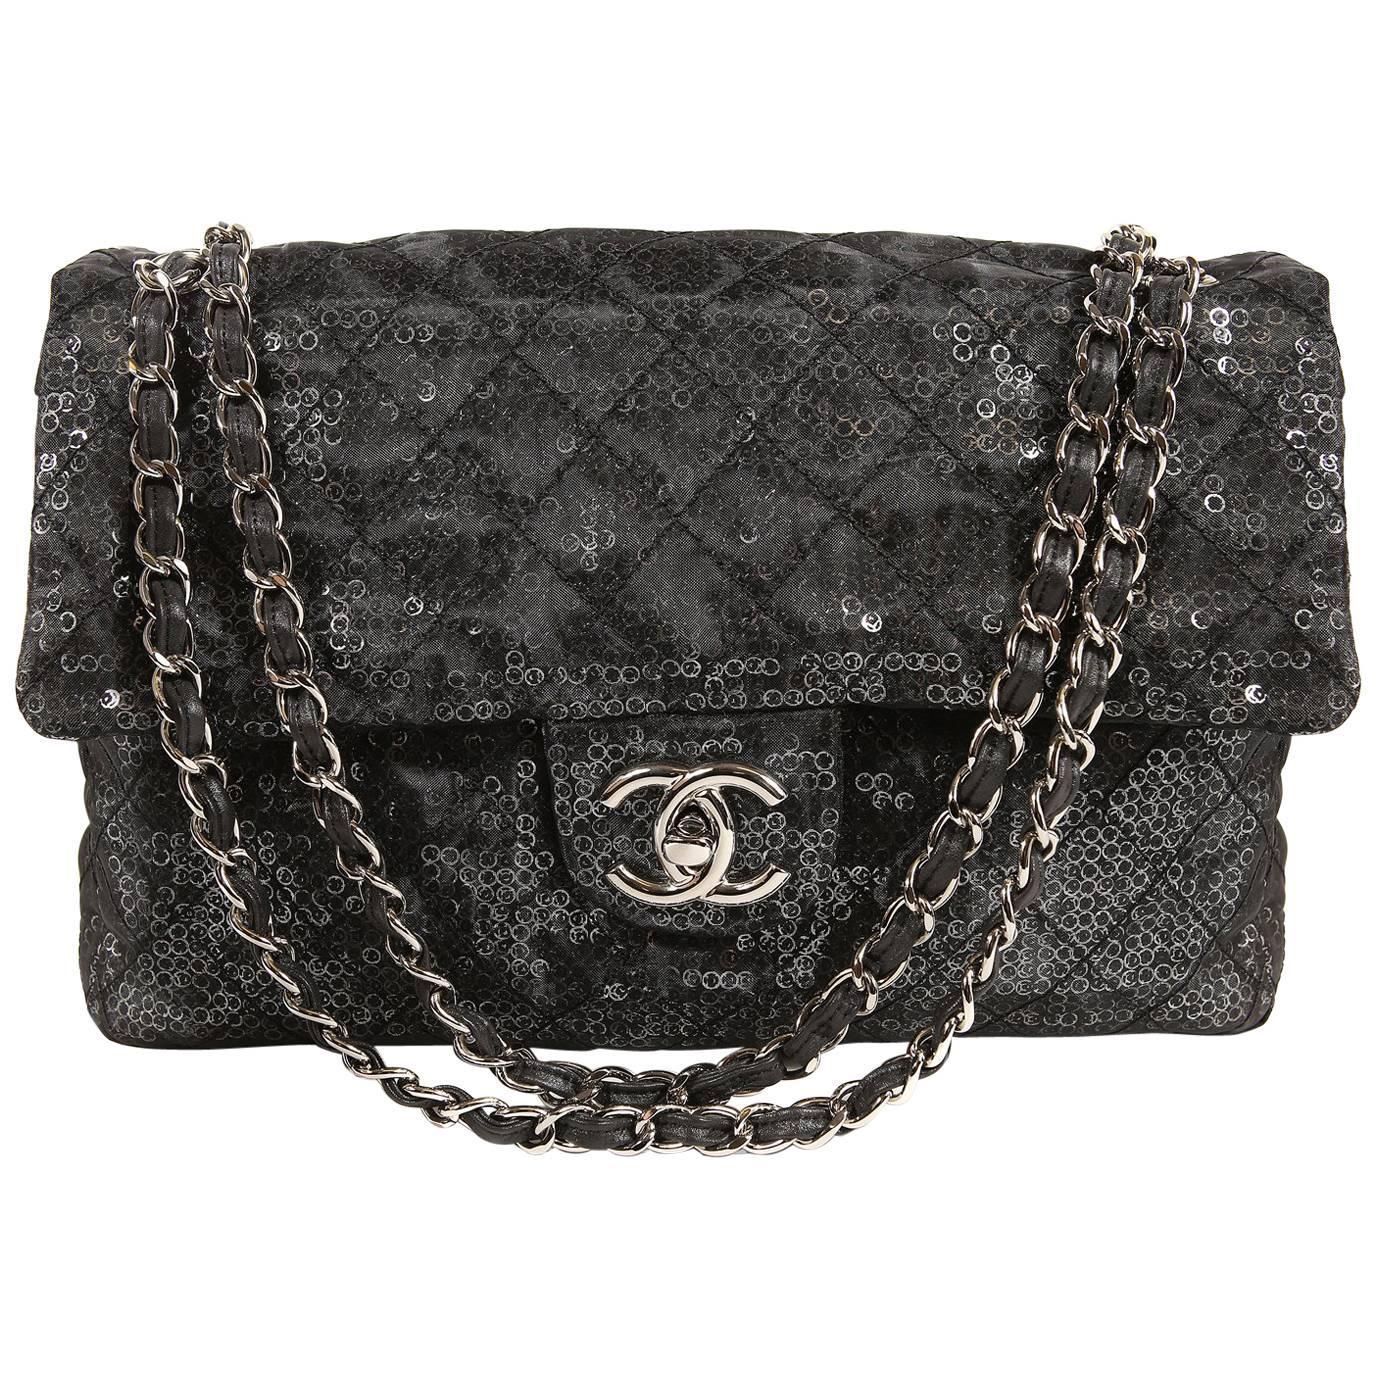 Chanel Hidden Sequins Jumbo Classic Flap Bag